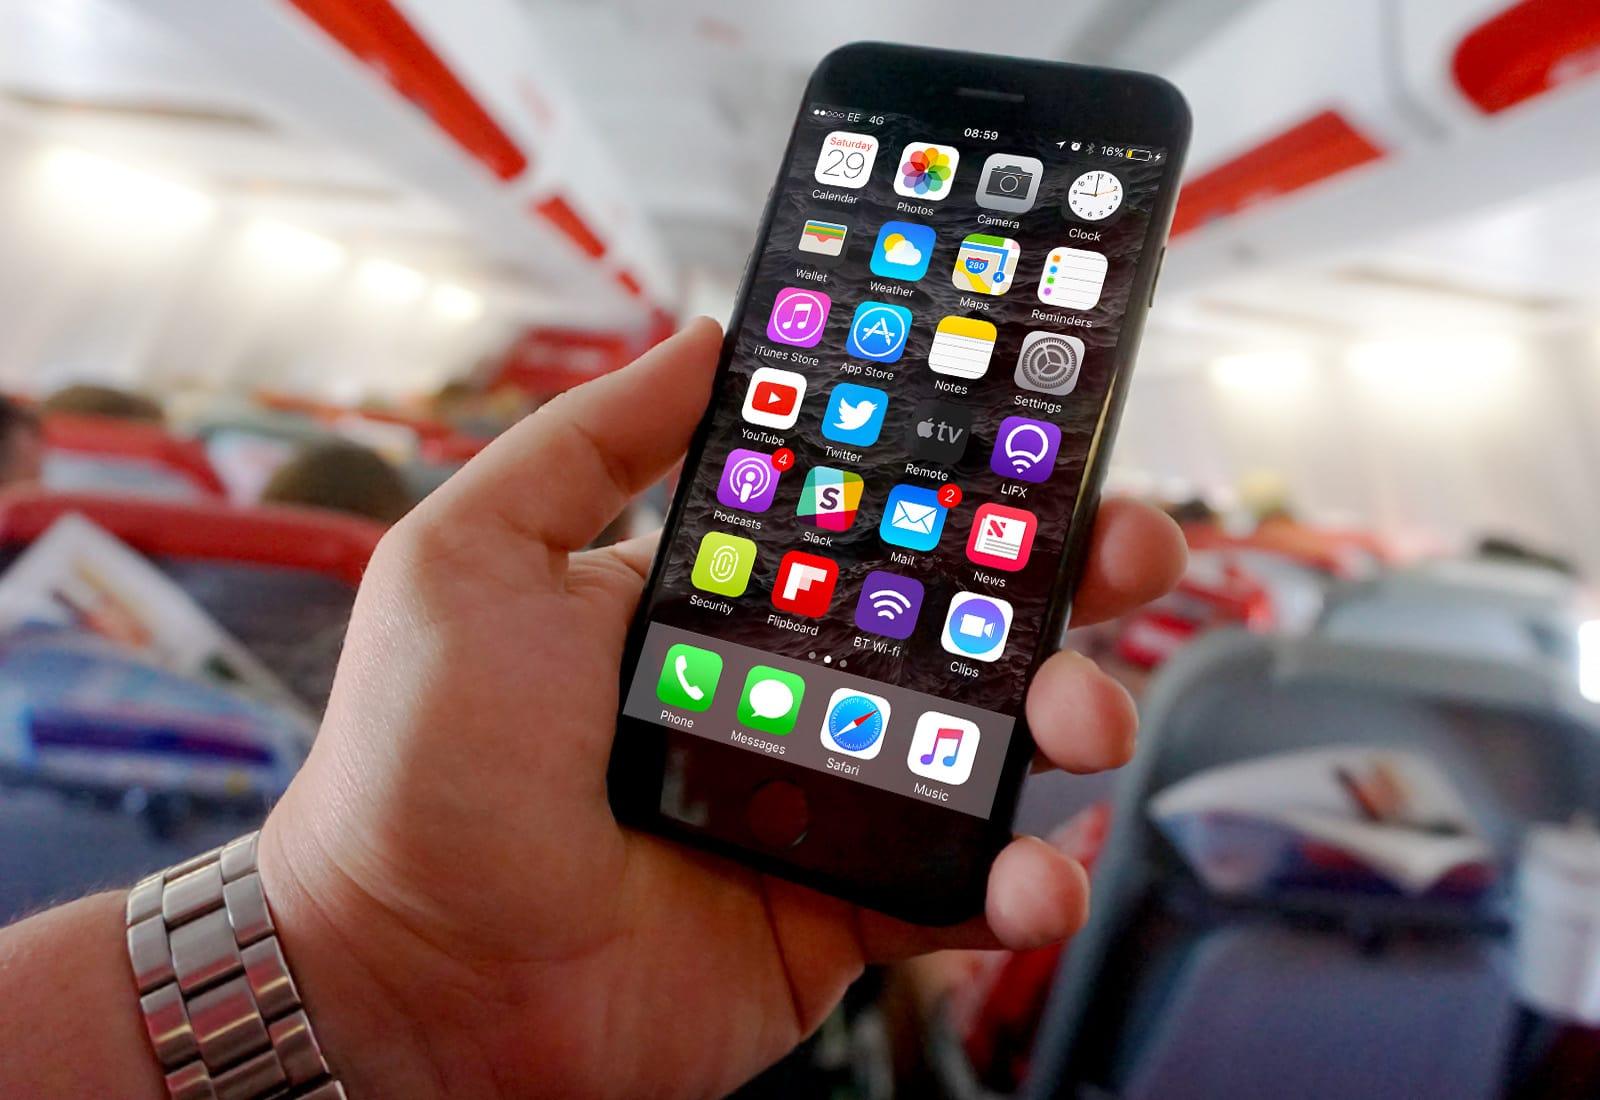 iPhone on plane